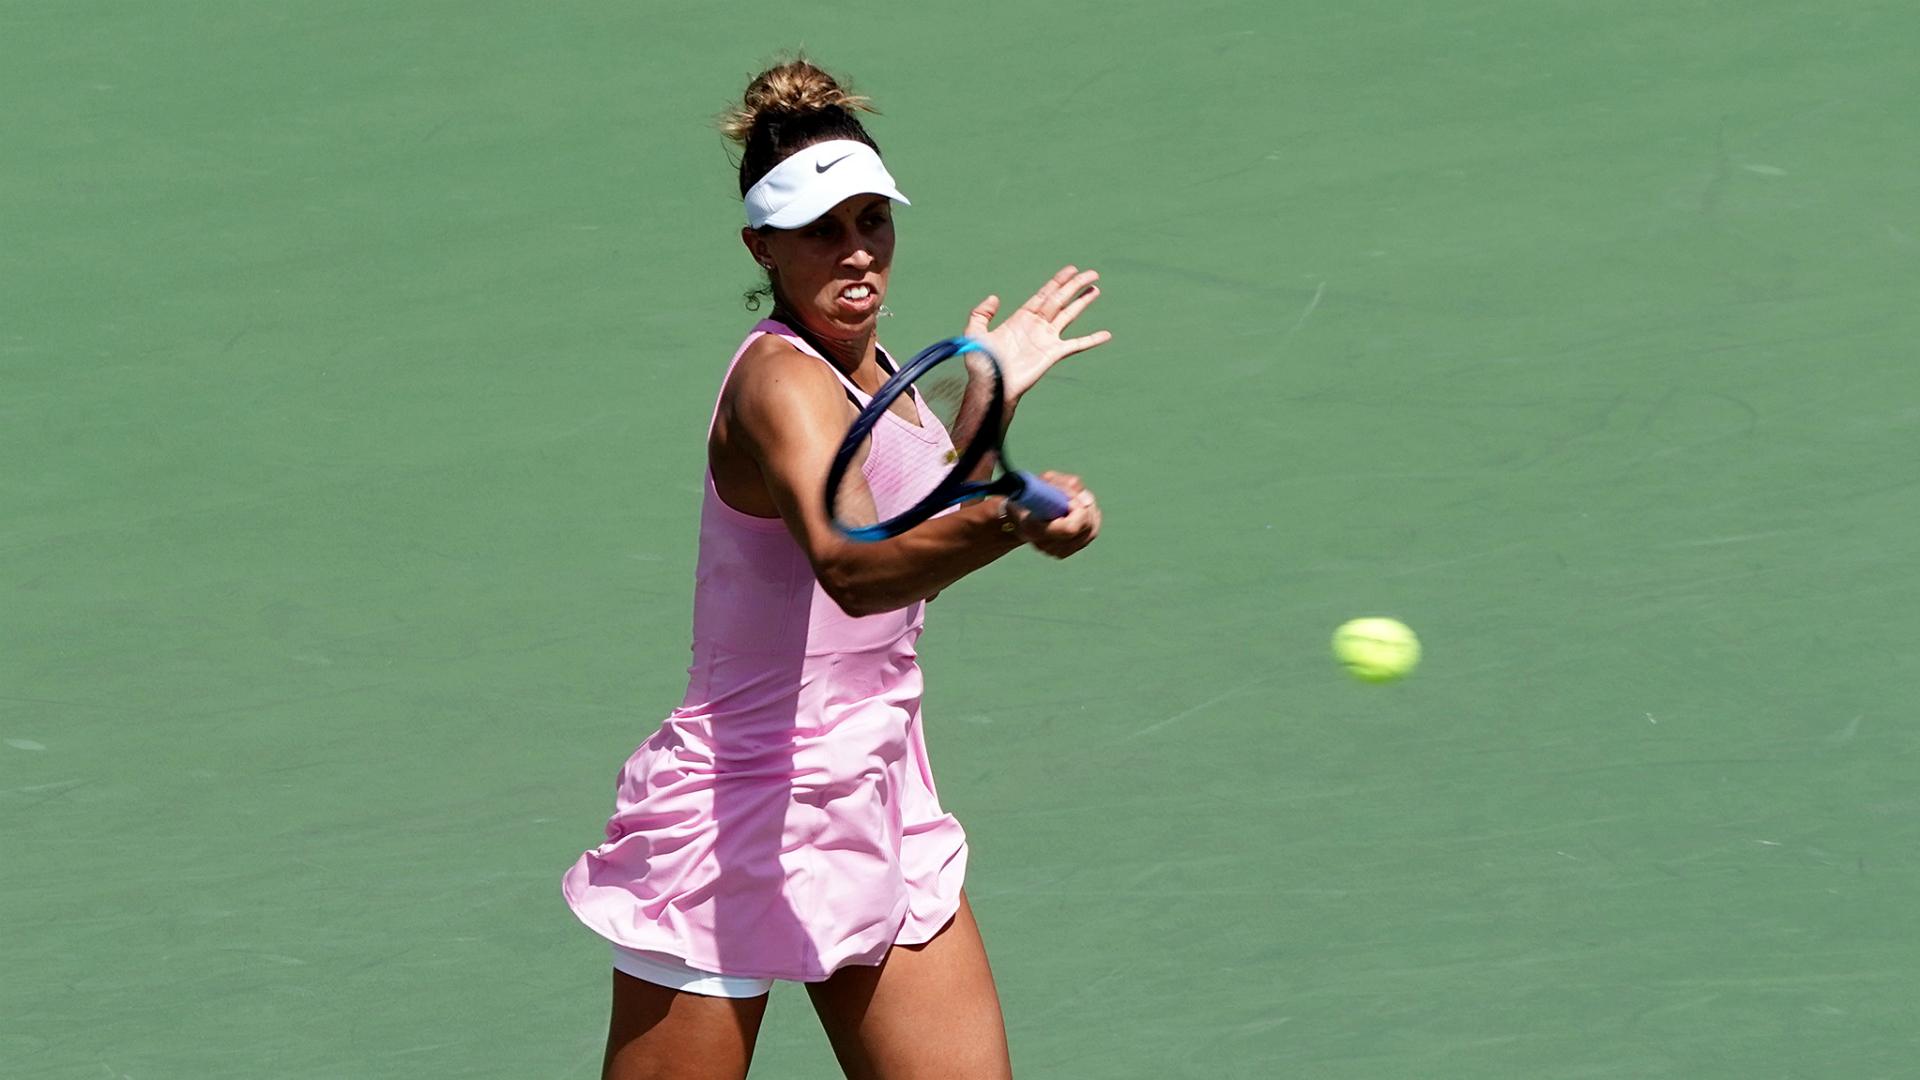 Keys set to miss Australian Open after positive COVID-19 test